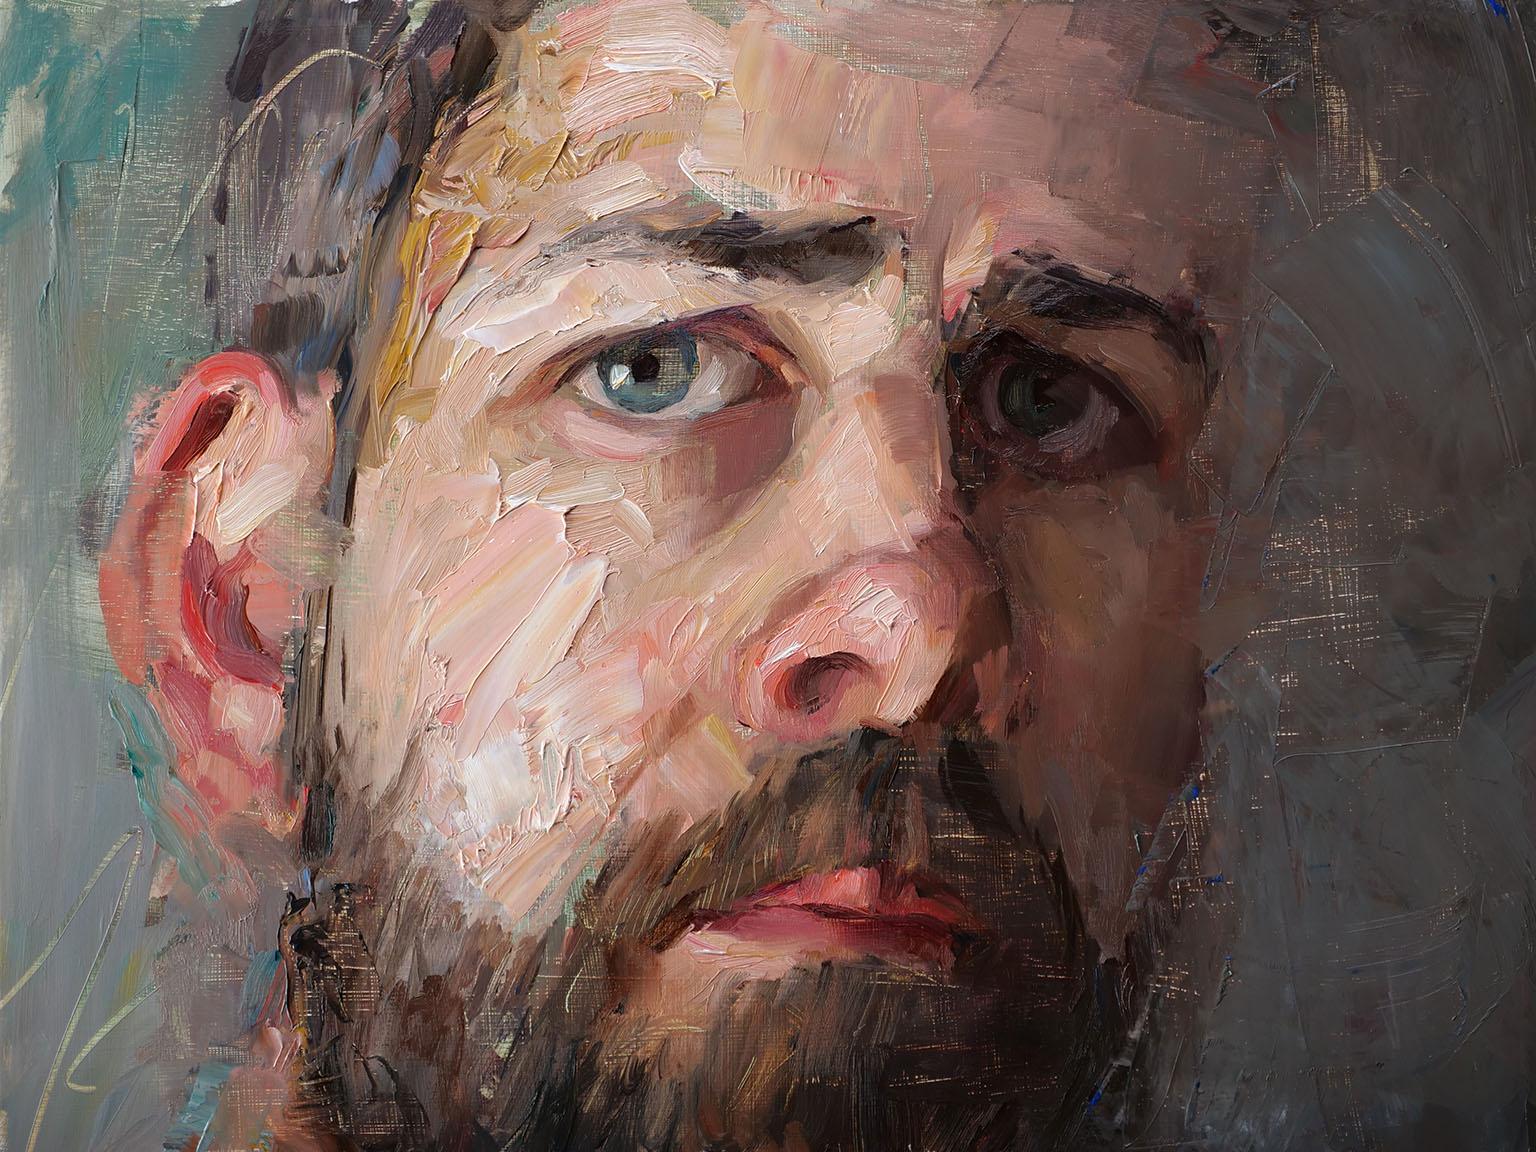 Matt Talbert |  Self Portrait  | oil on panel | 12x16 inches | 2018